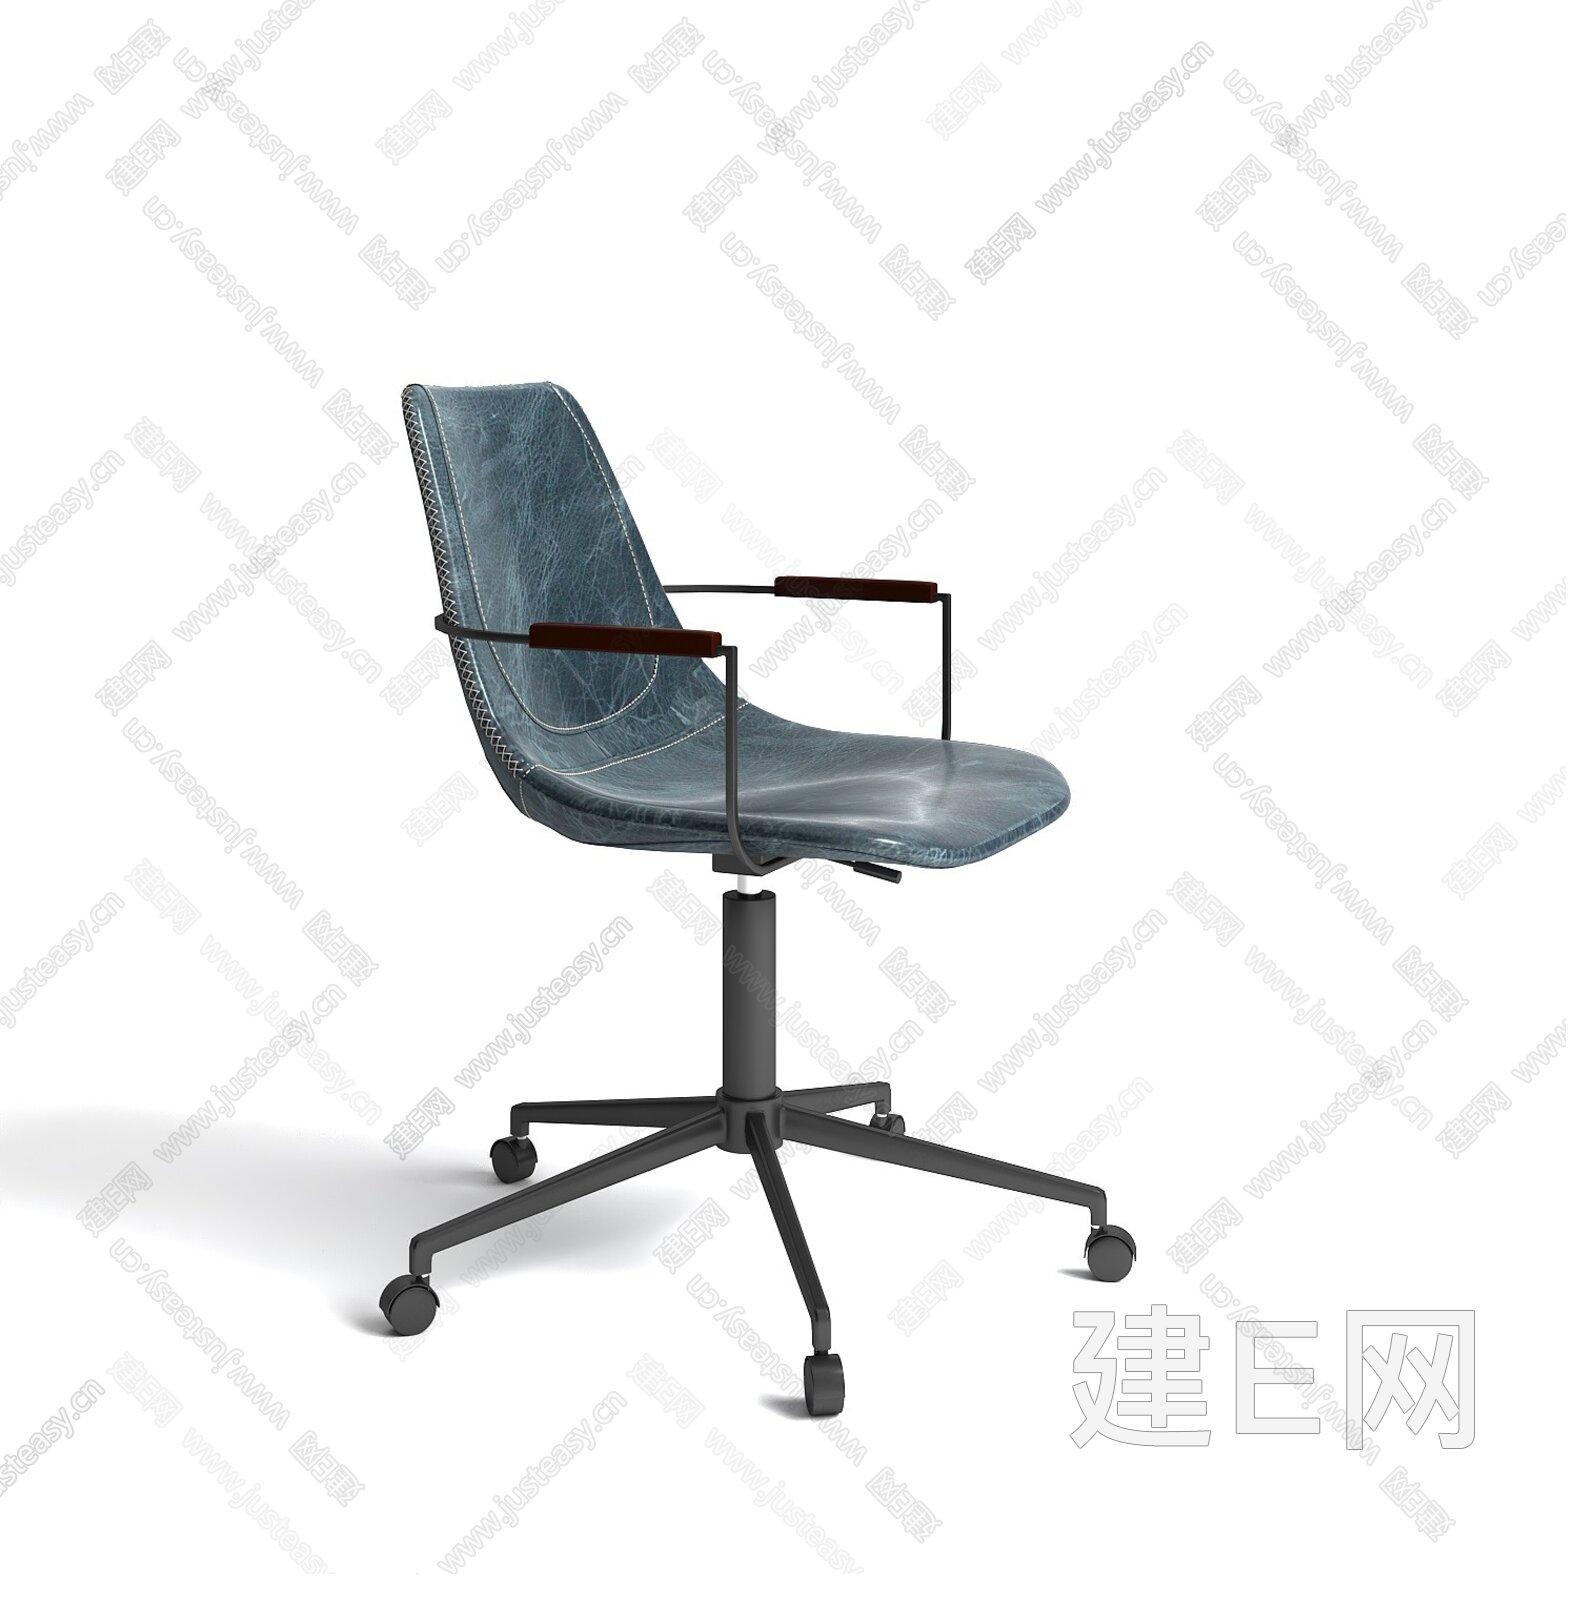 BogiBogie 博毅 北欧办公椅3d模型